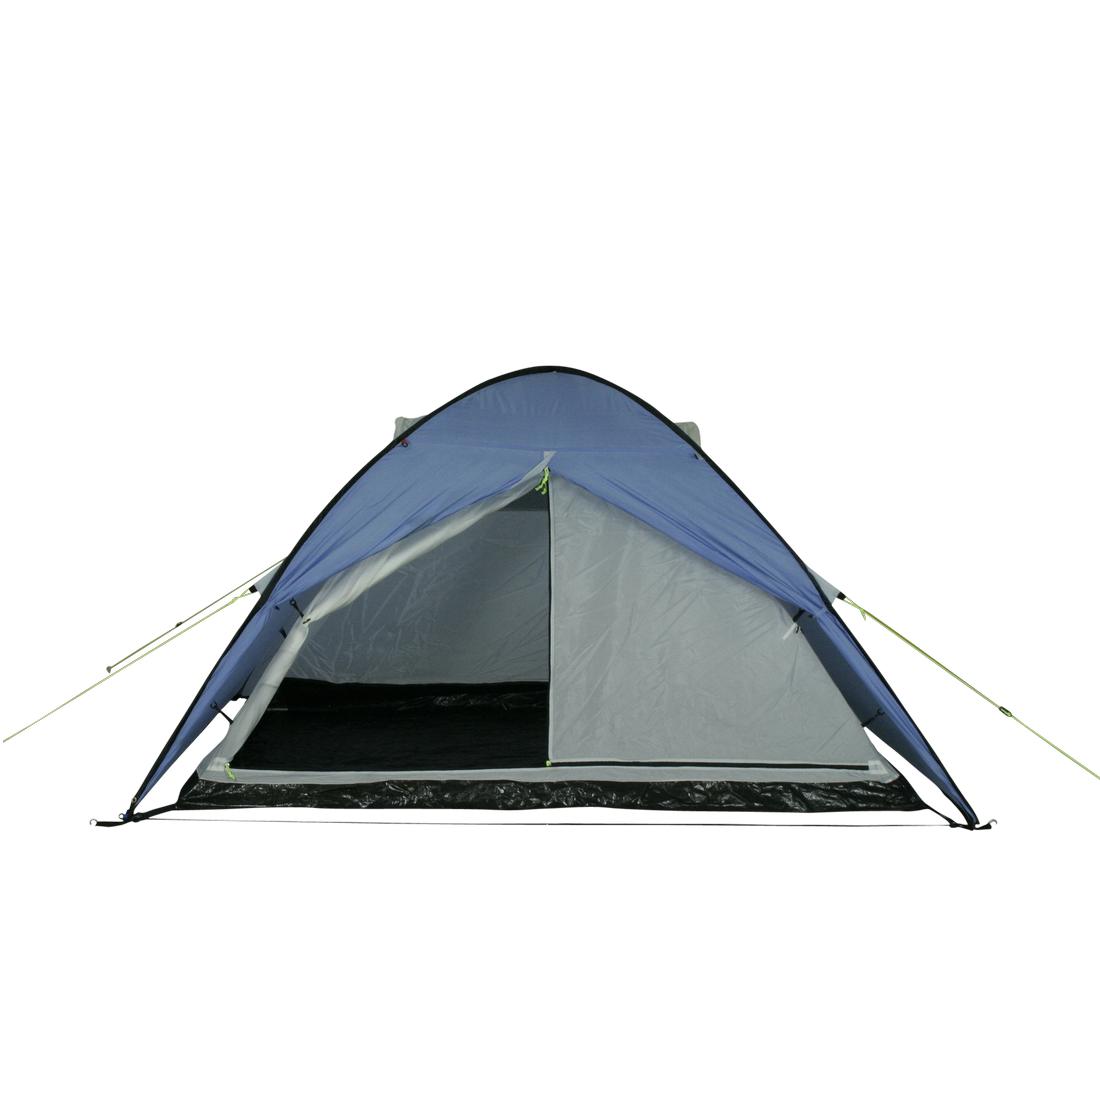 Nuevo melamina camping utensilios line blanco azul camping utensilios OVP 4 personas